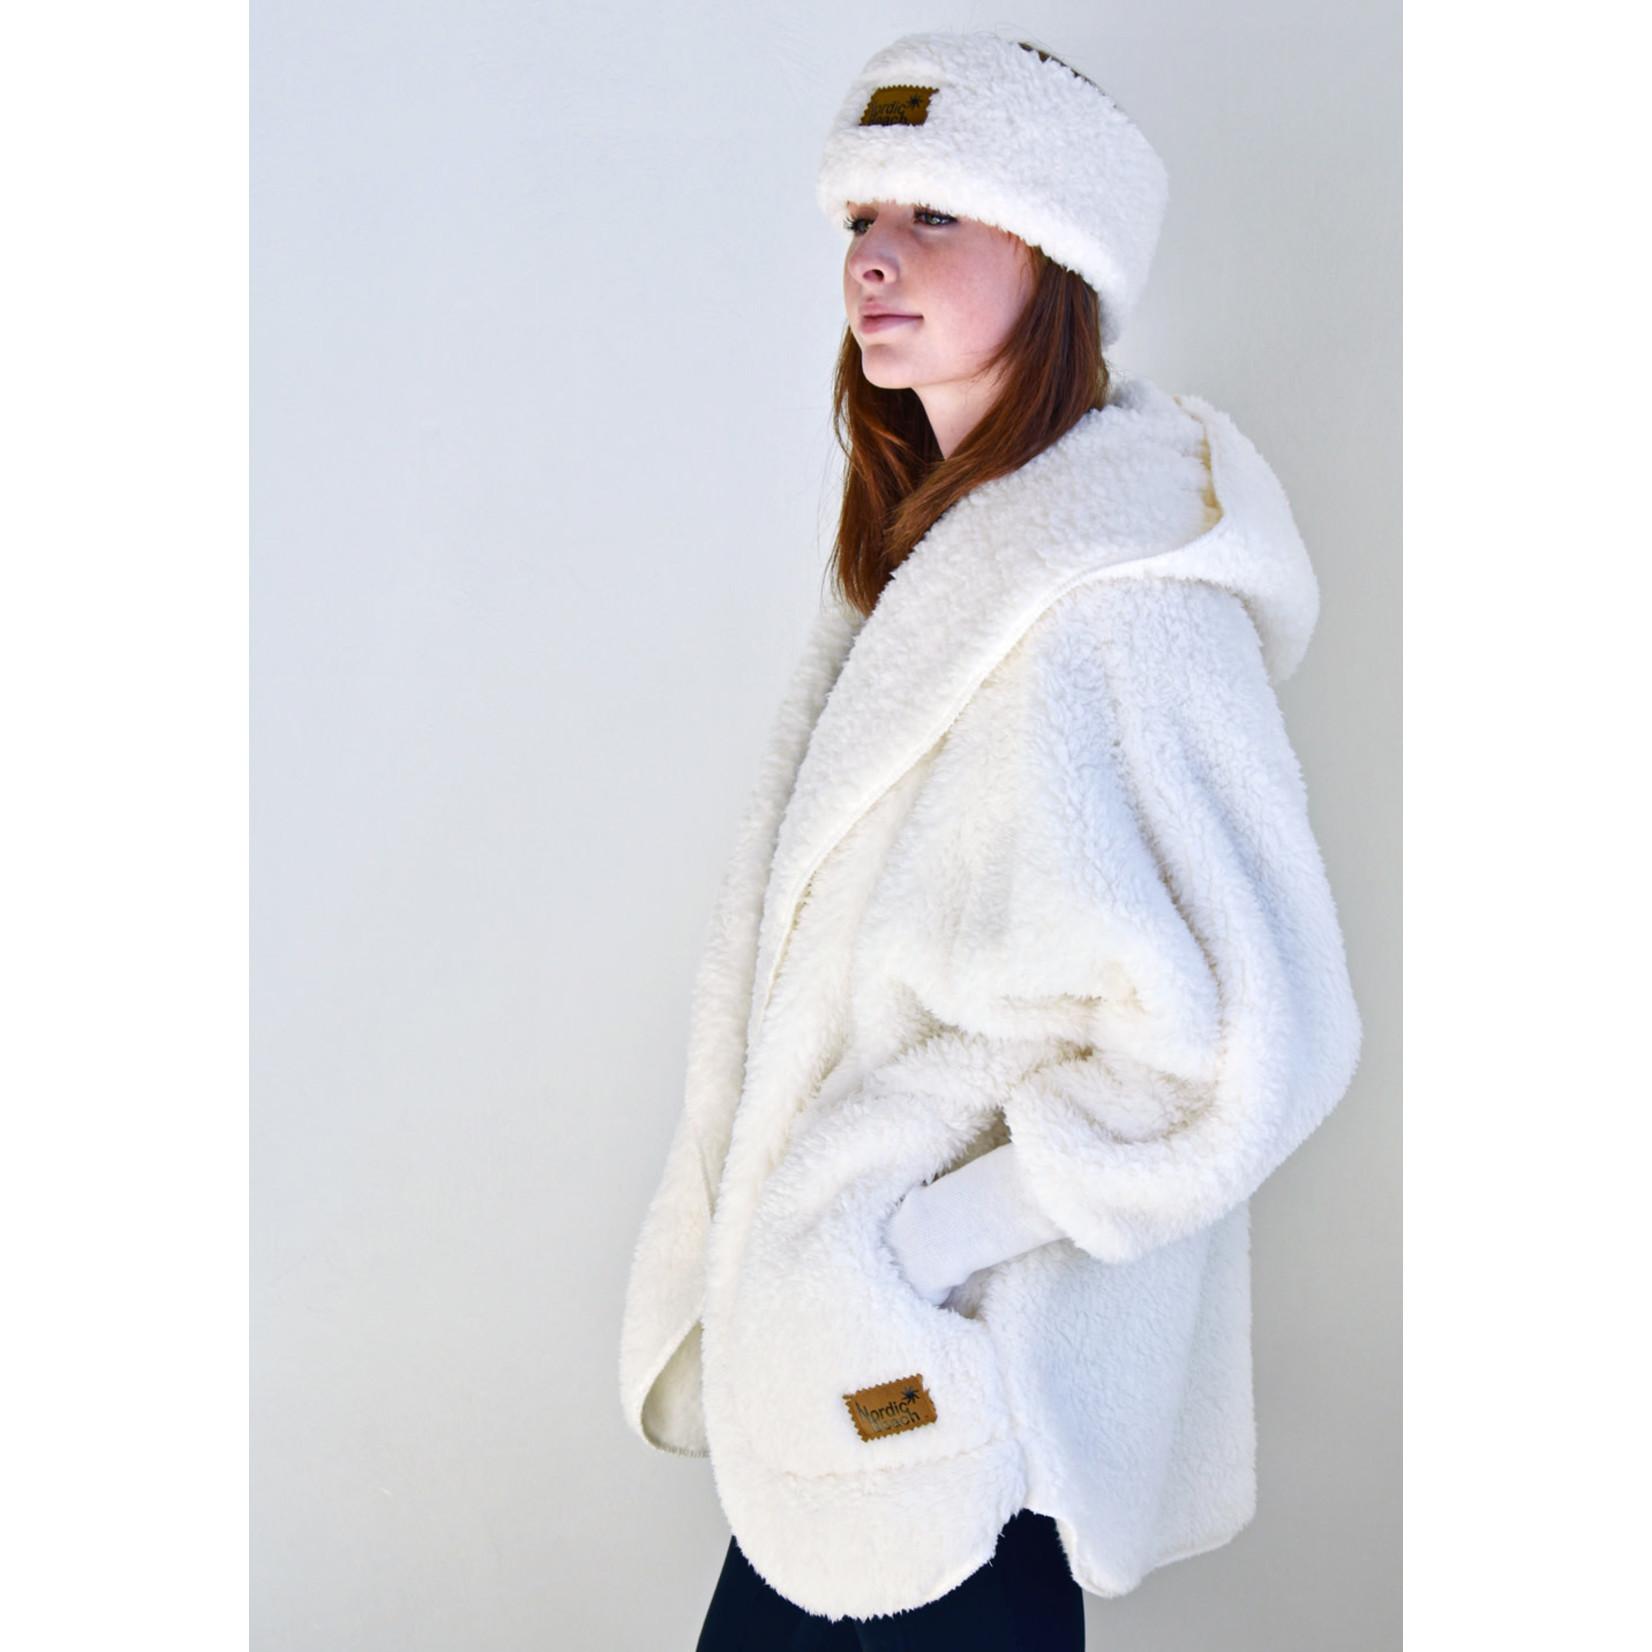 Nordic Beach Fuzzy Fleece Hooded Cardigan in Nordic Snow